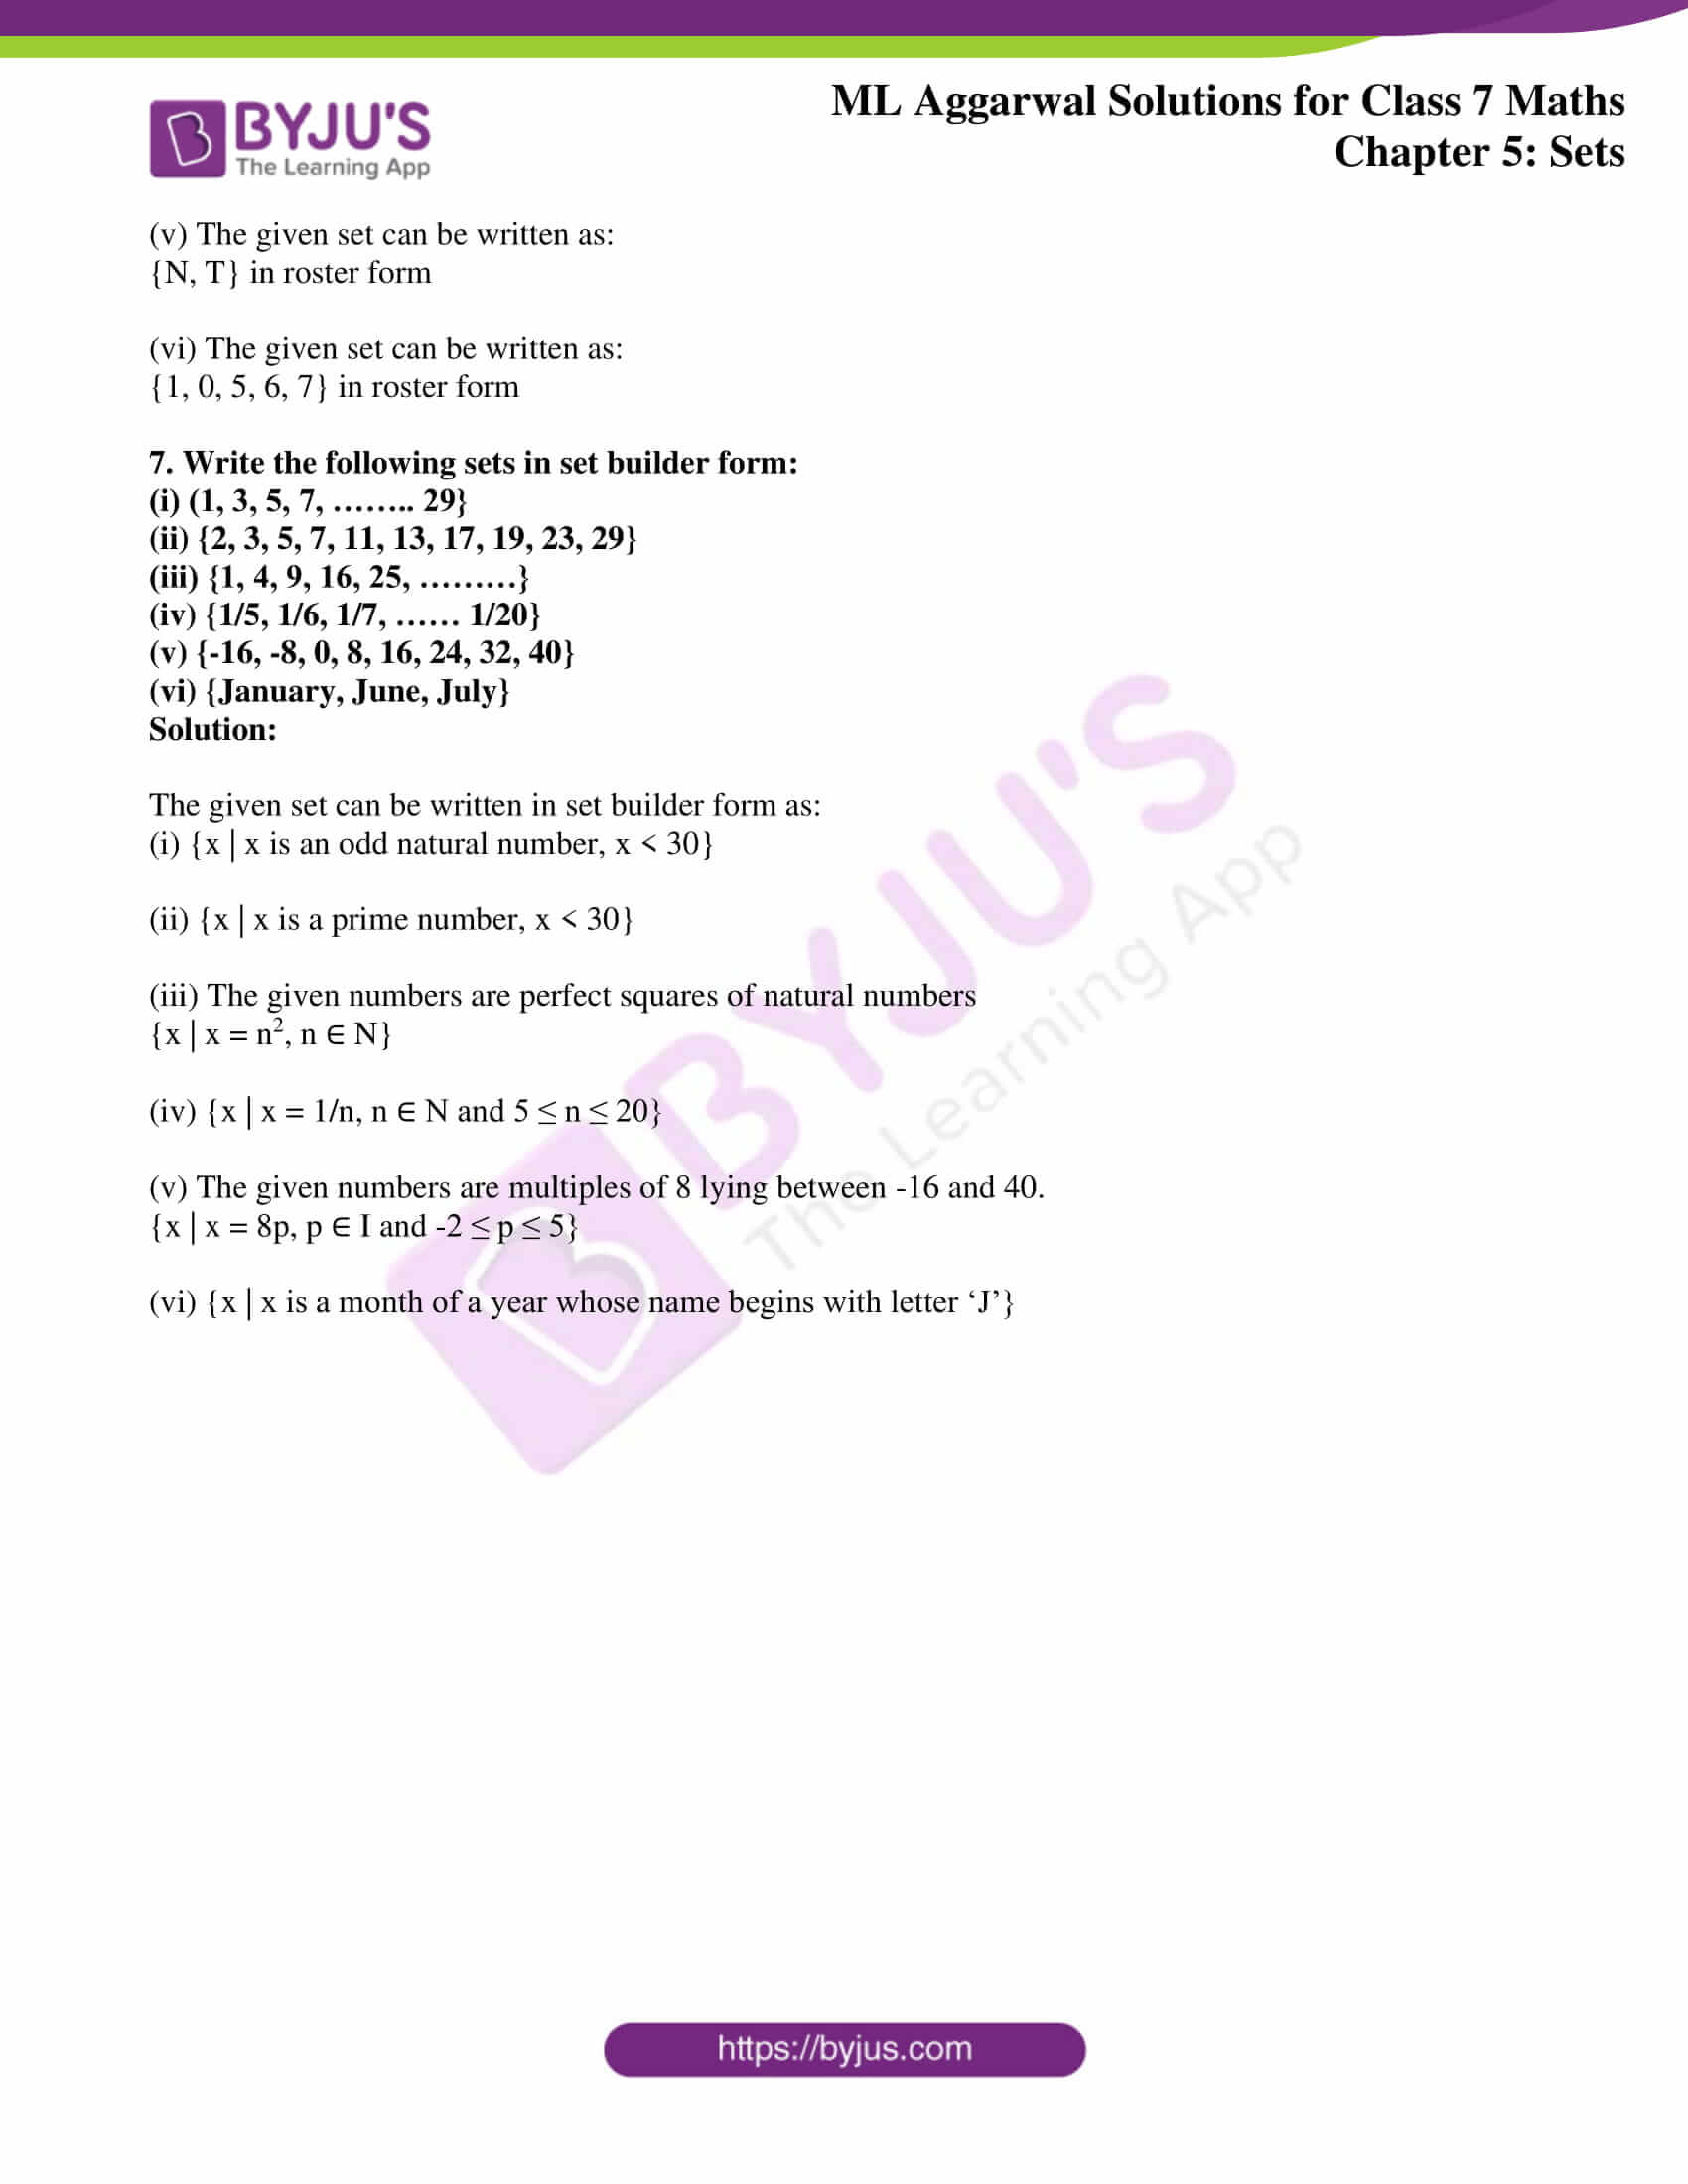 ml aggarwal sol class 7 maths chapter 5 4